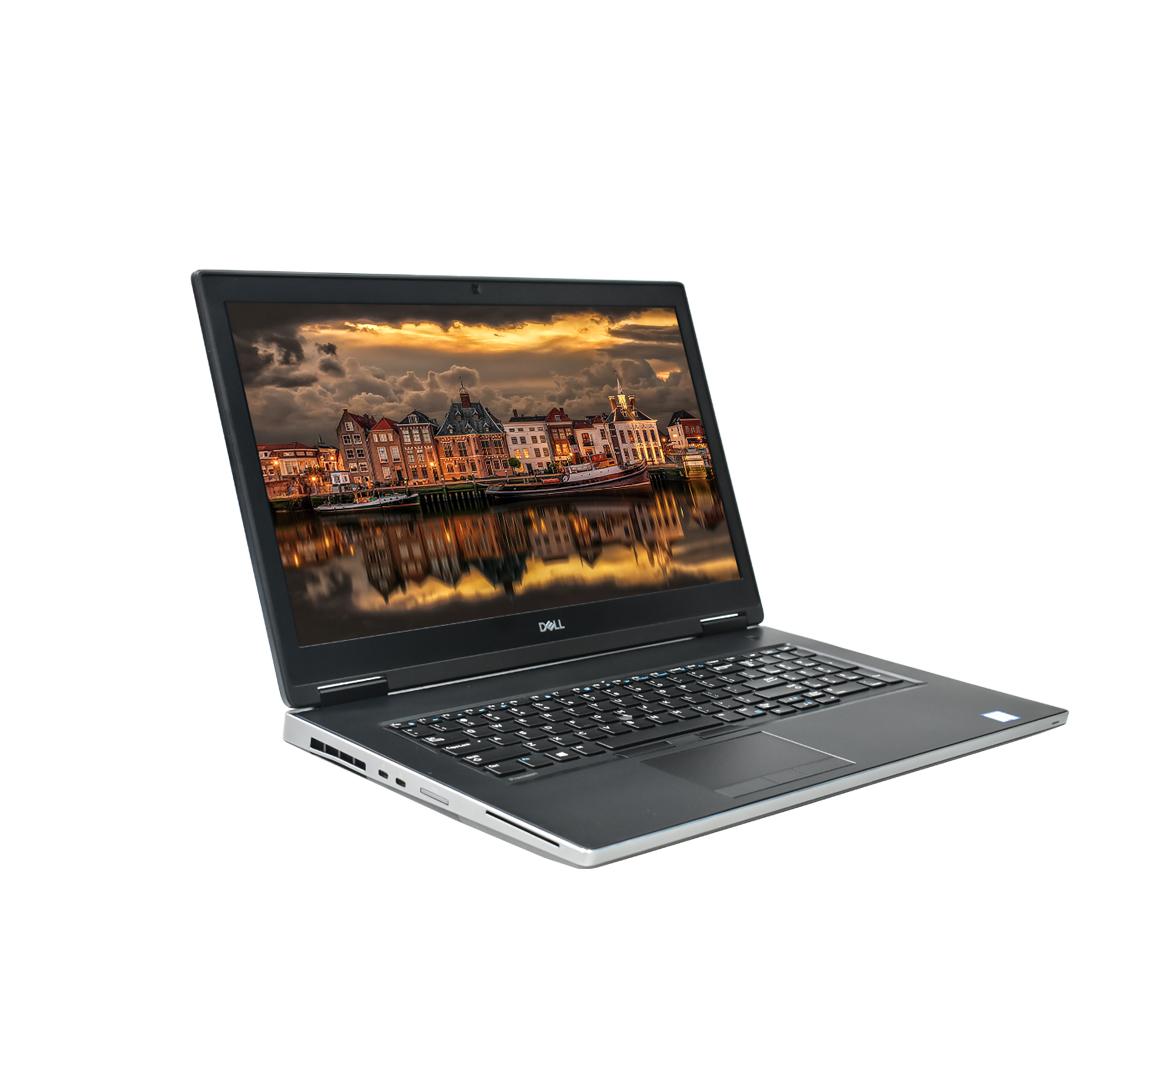 Dell Precision 7730 Business Laptop, Intel XEON E-2186M CPU, 16GB DDR4 SODIMM RAM, 256GB SSD M2, 17 inch Display, Windows 10 Pro (Refurbished)